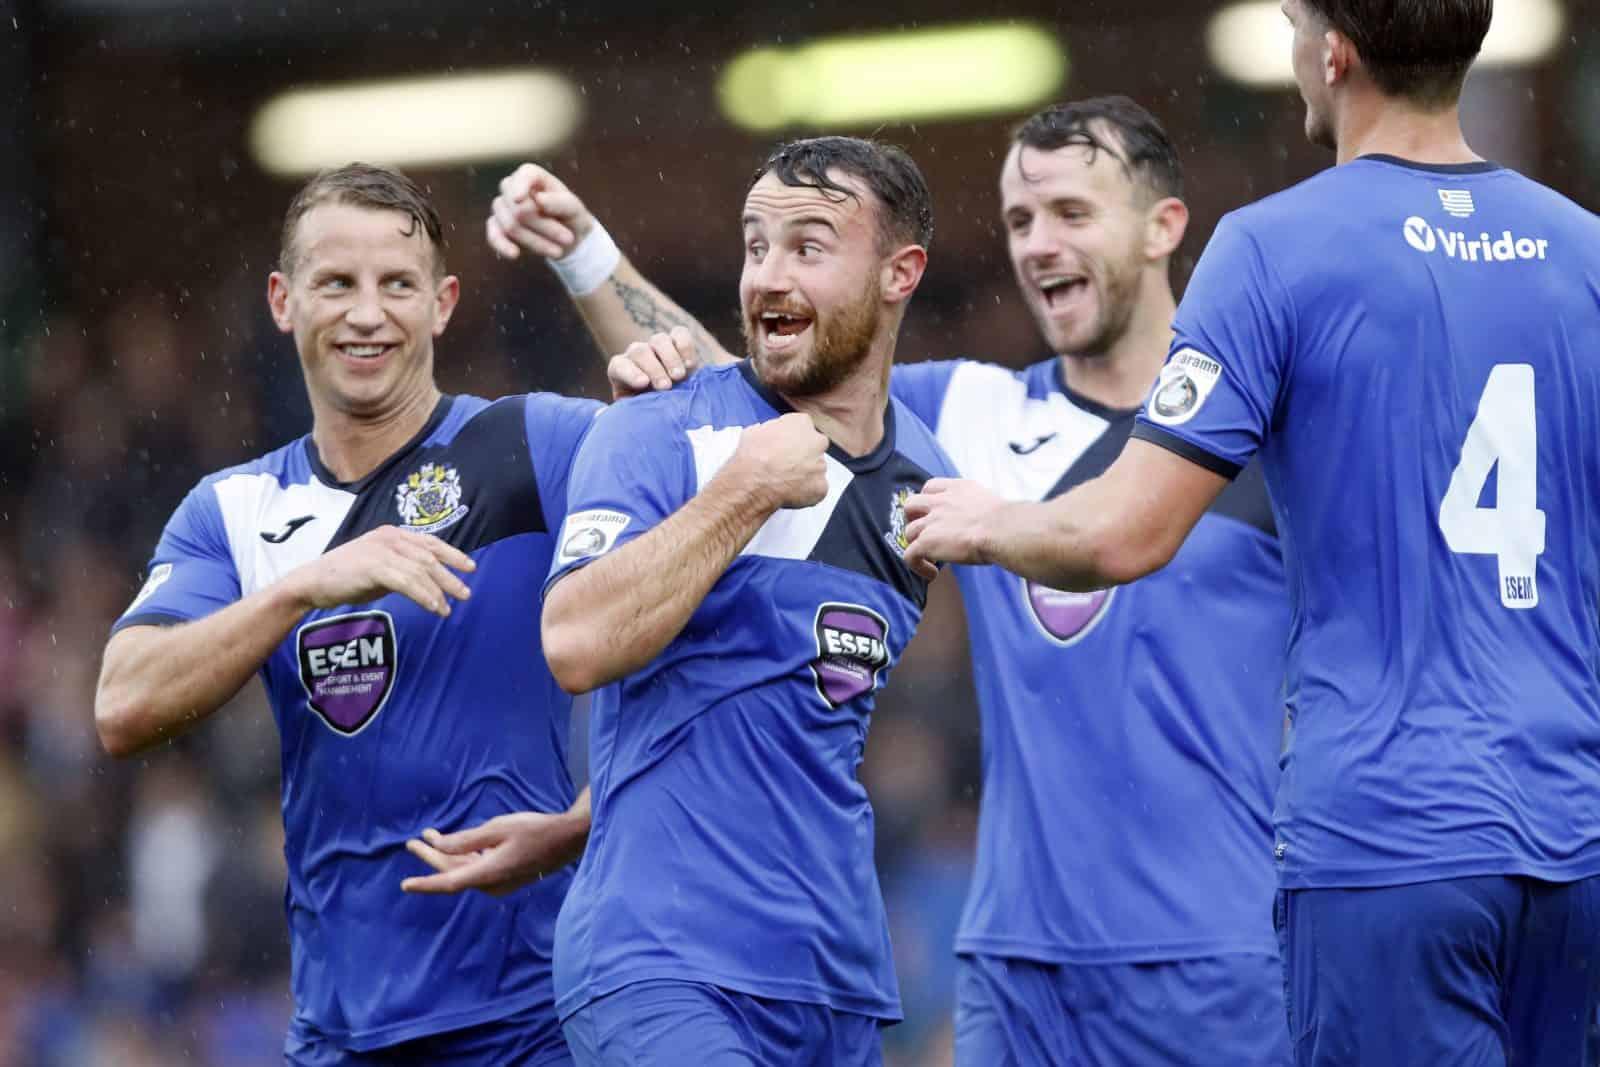 Matty Warburton, Stockport County 3-3 FC United 30.9.17